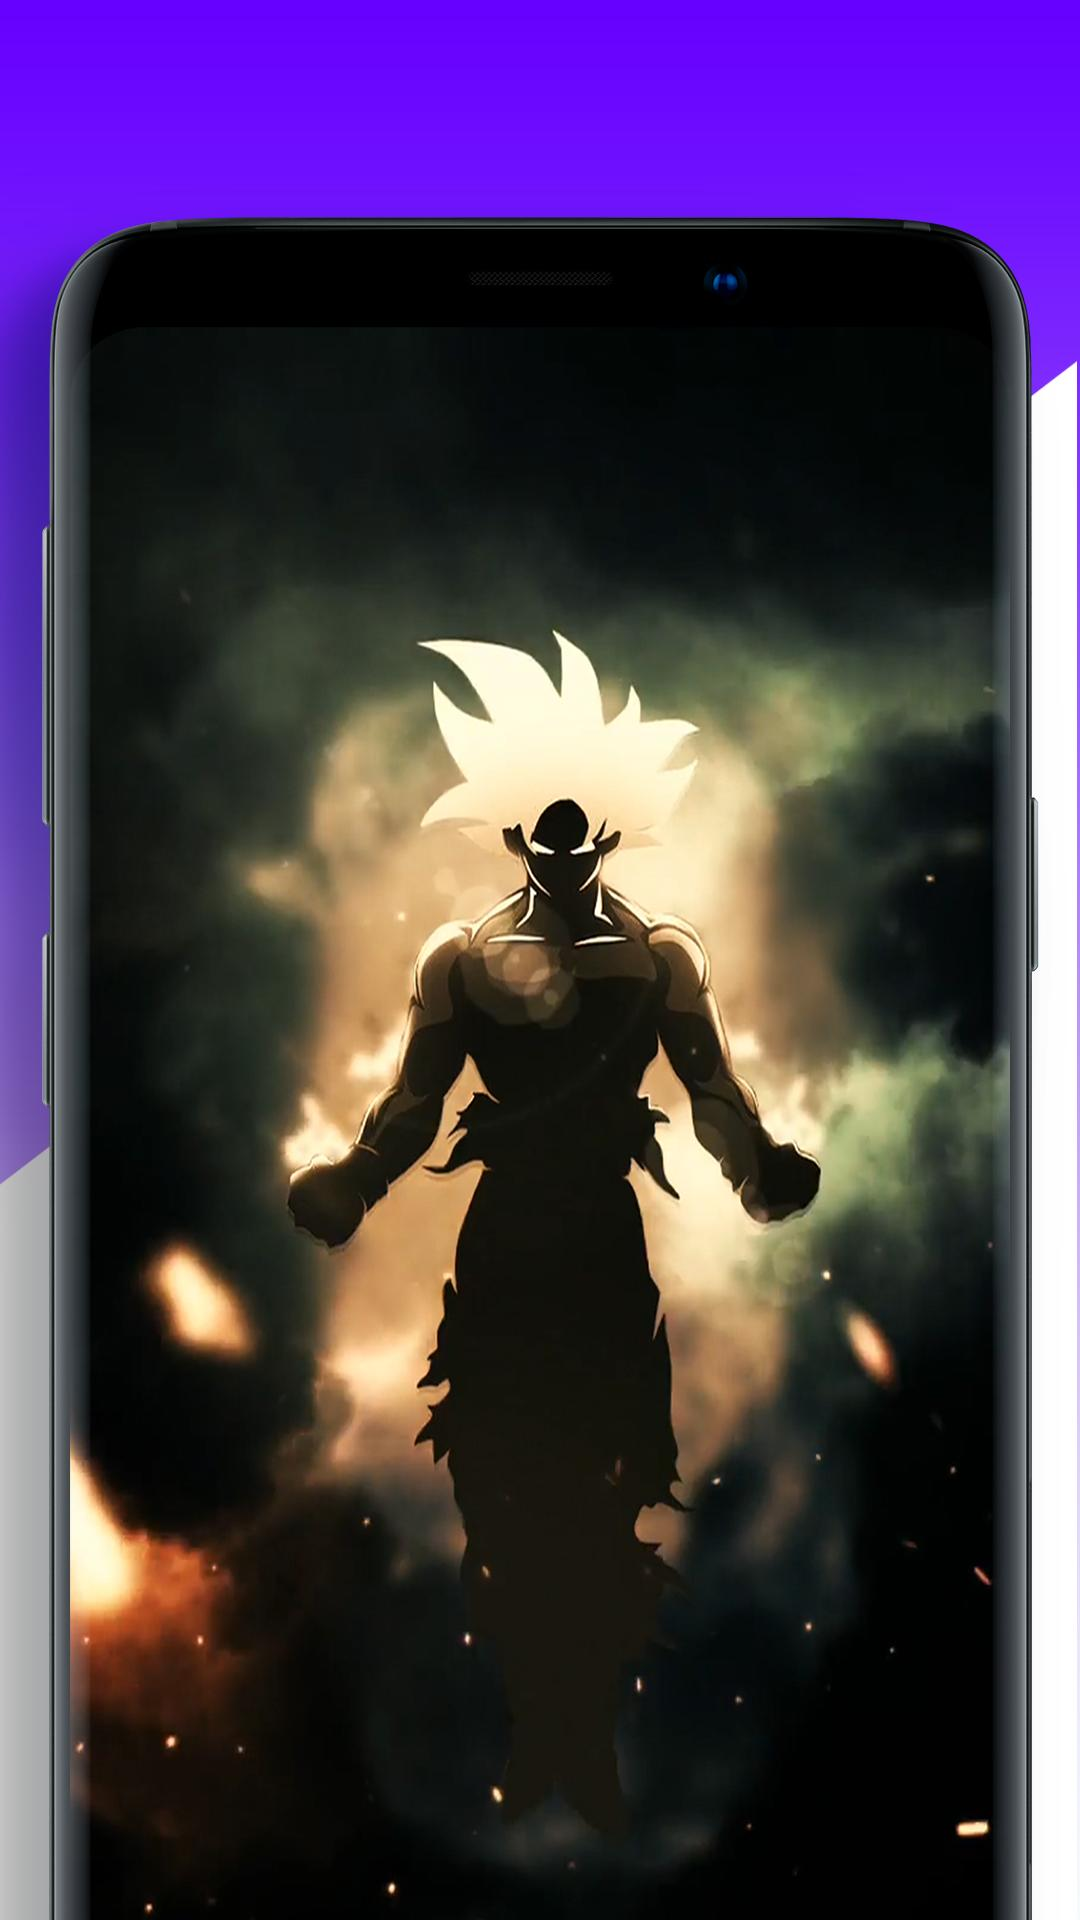 Dbz Anime Live Wallpaper Goku Hd Video Animation For